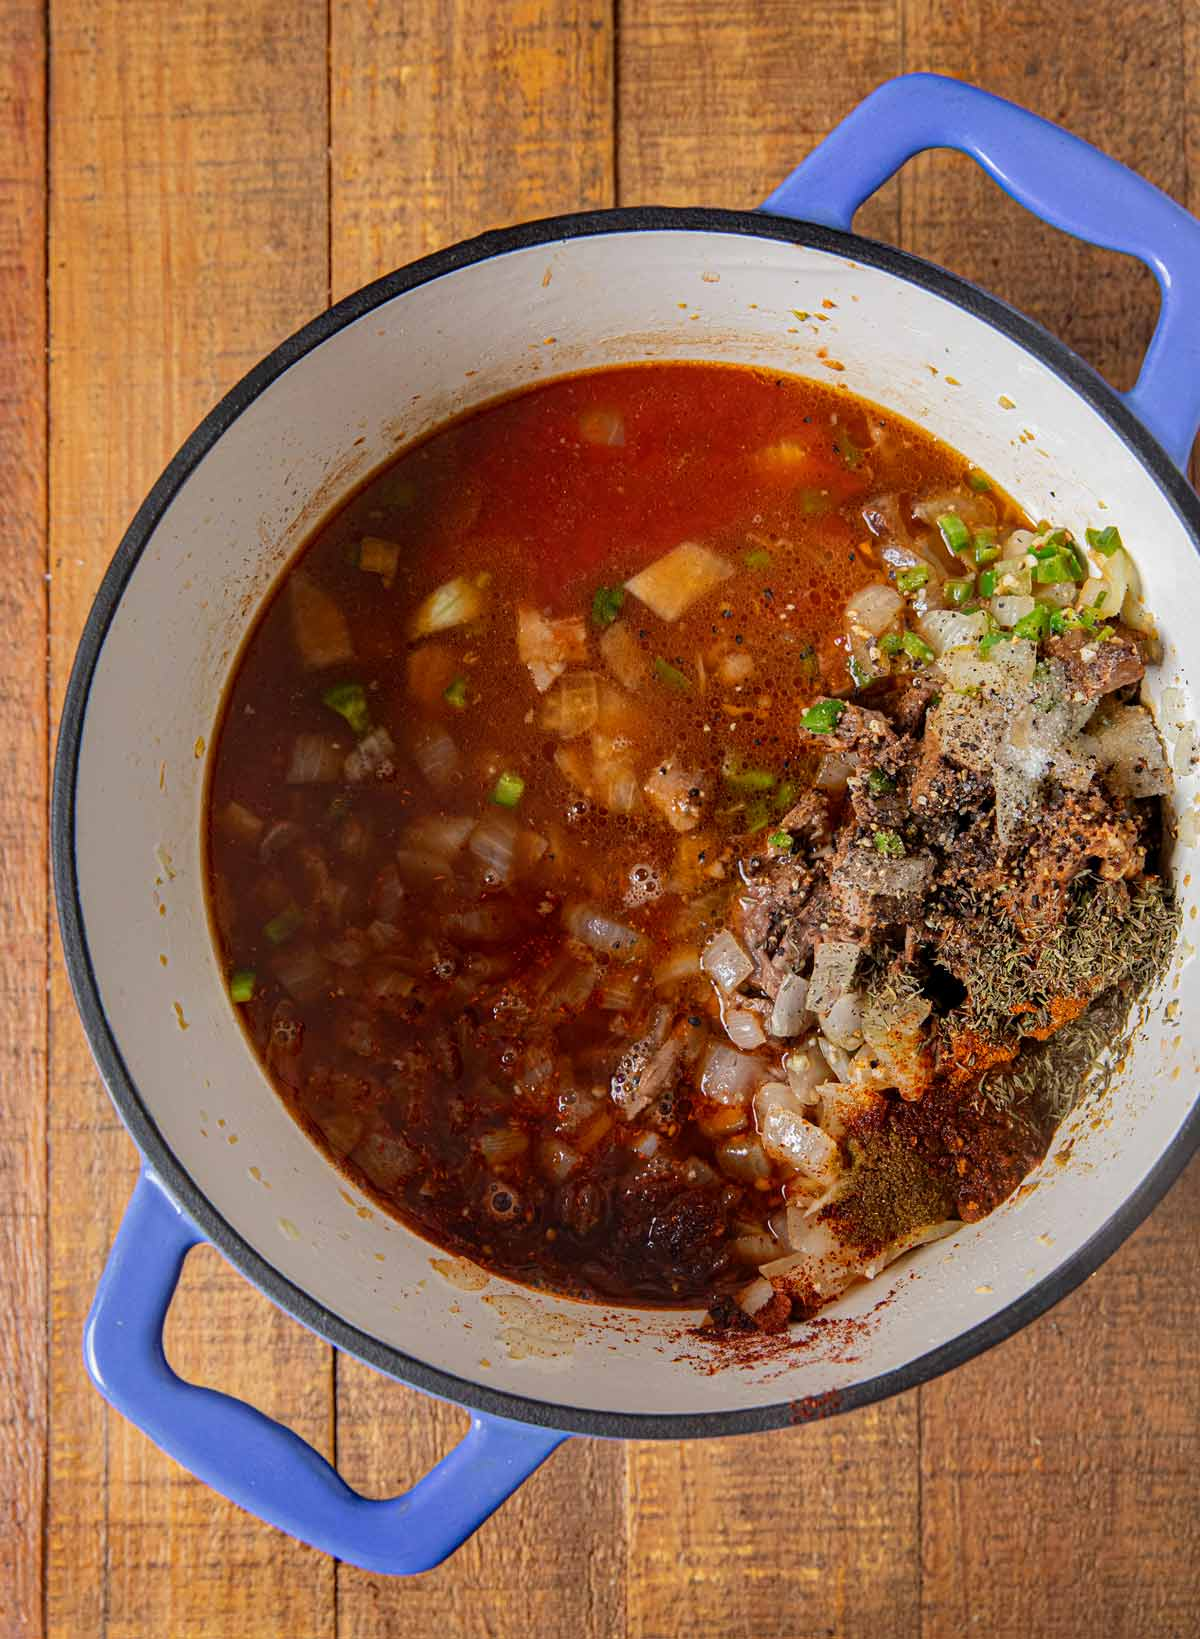 Texas Brisket Chili ingredients in pot